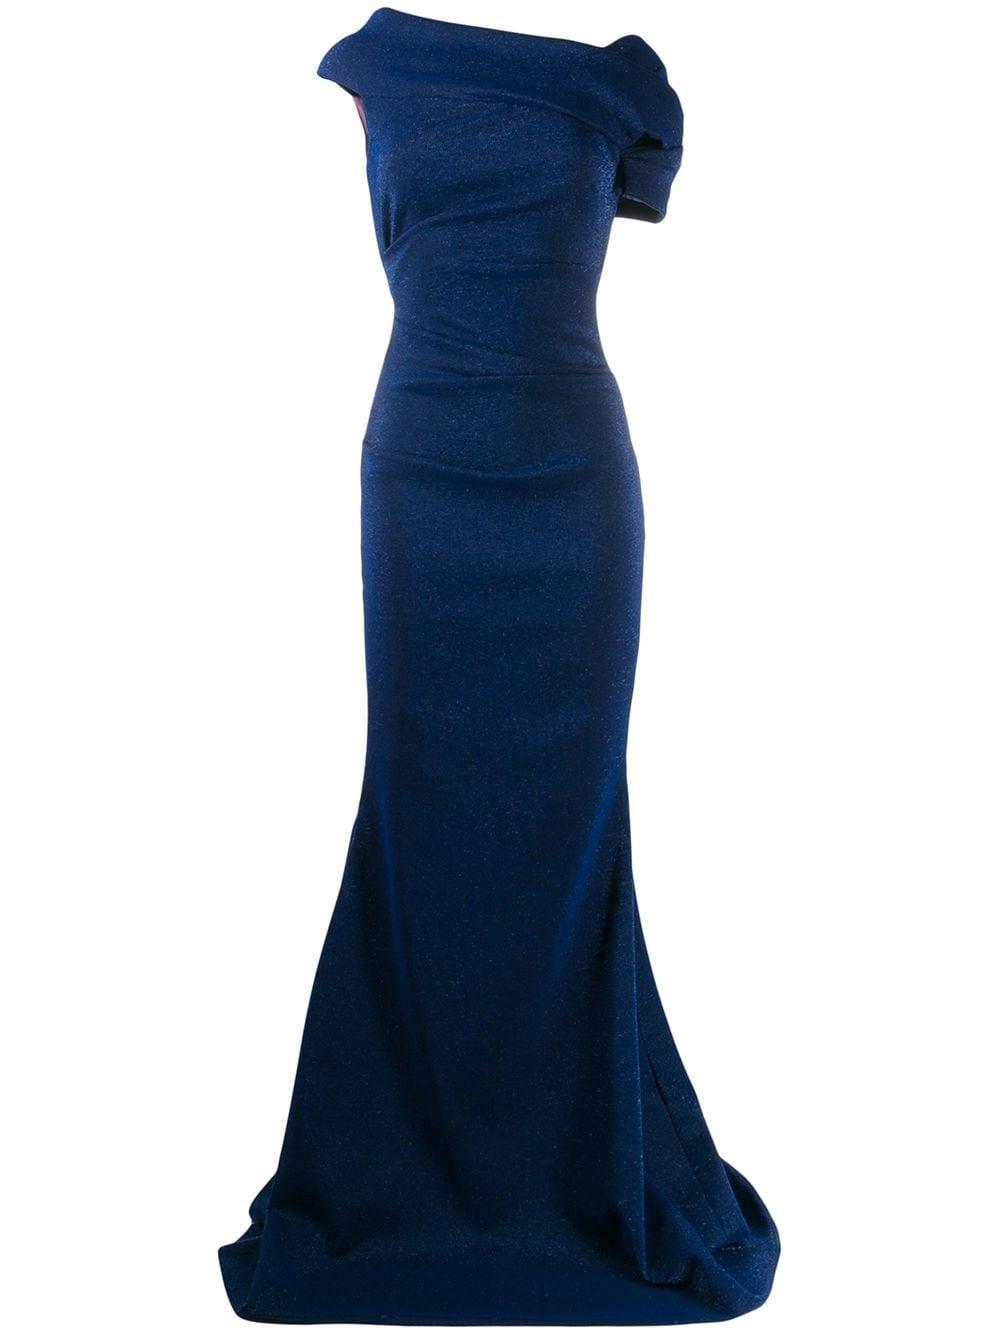 Bonette Gown